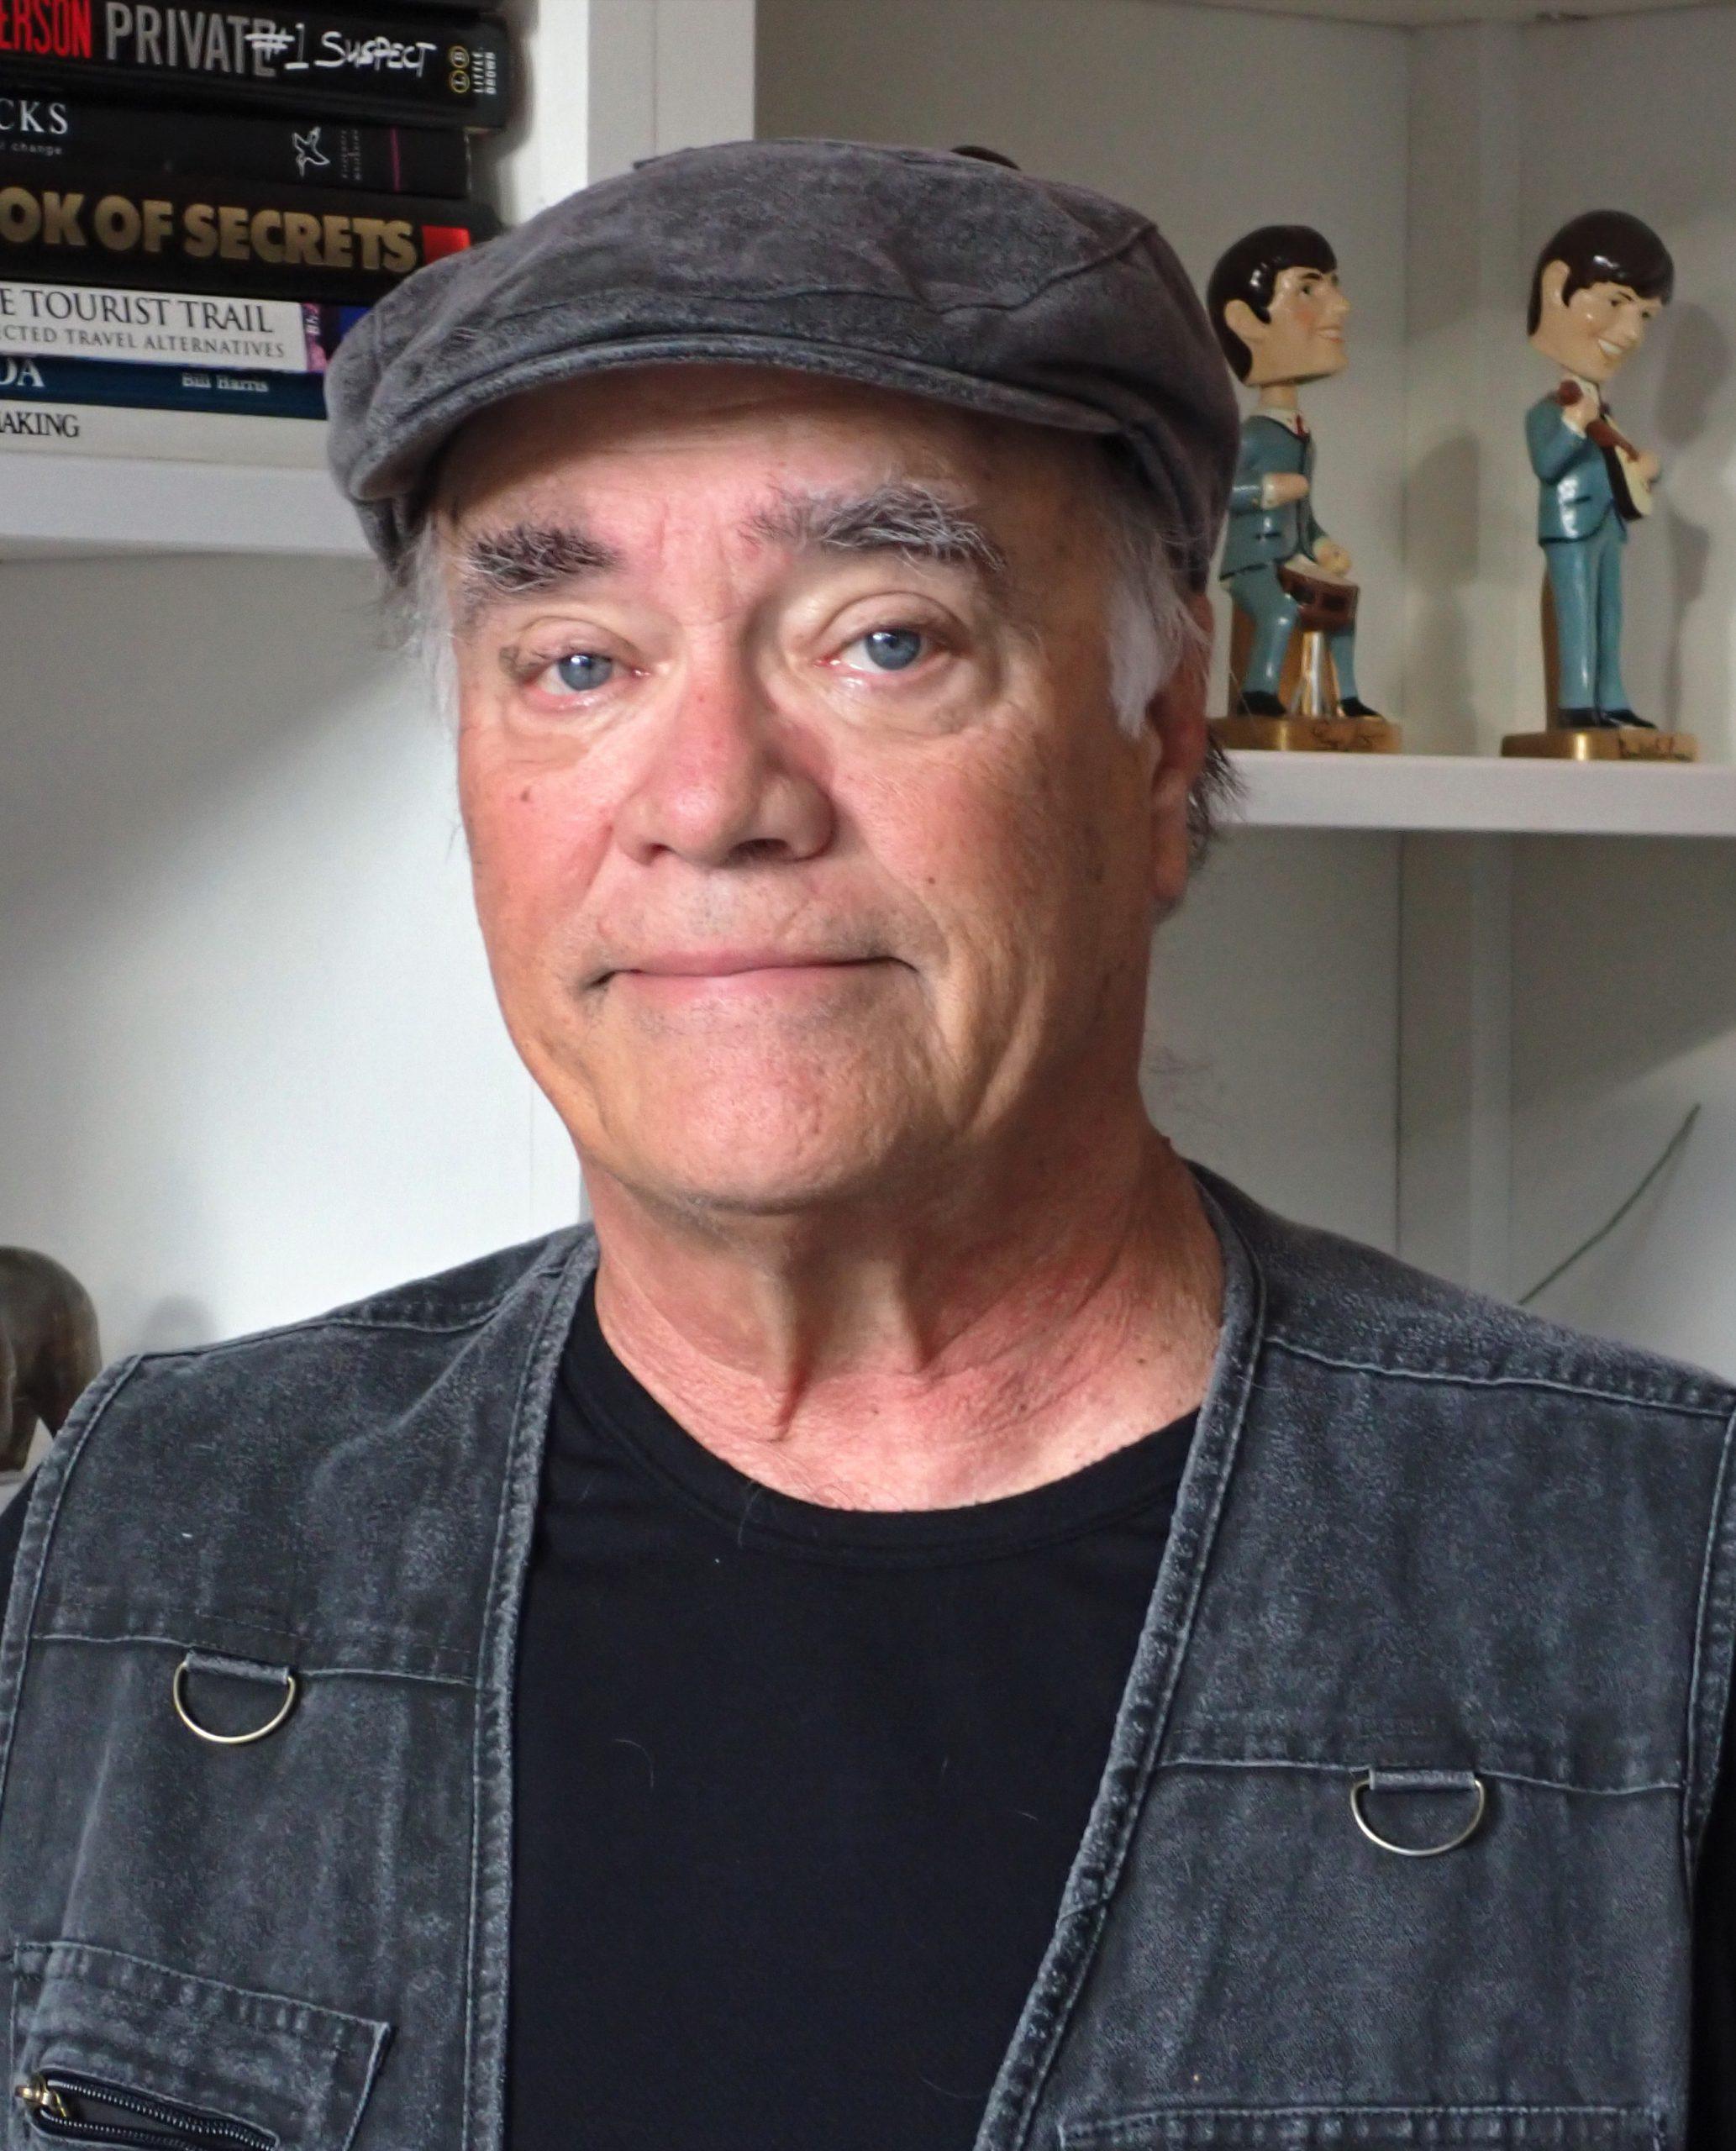 Duncan Bristow